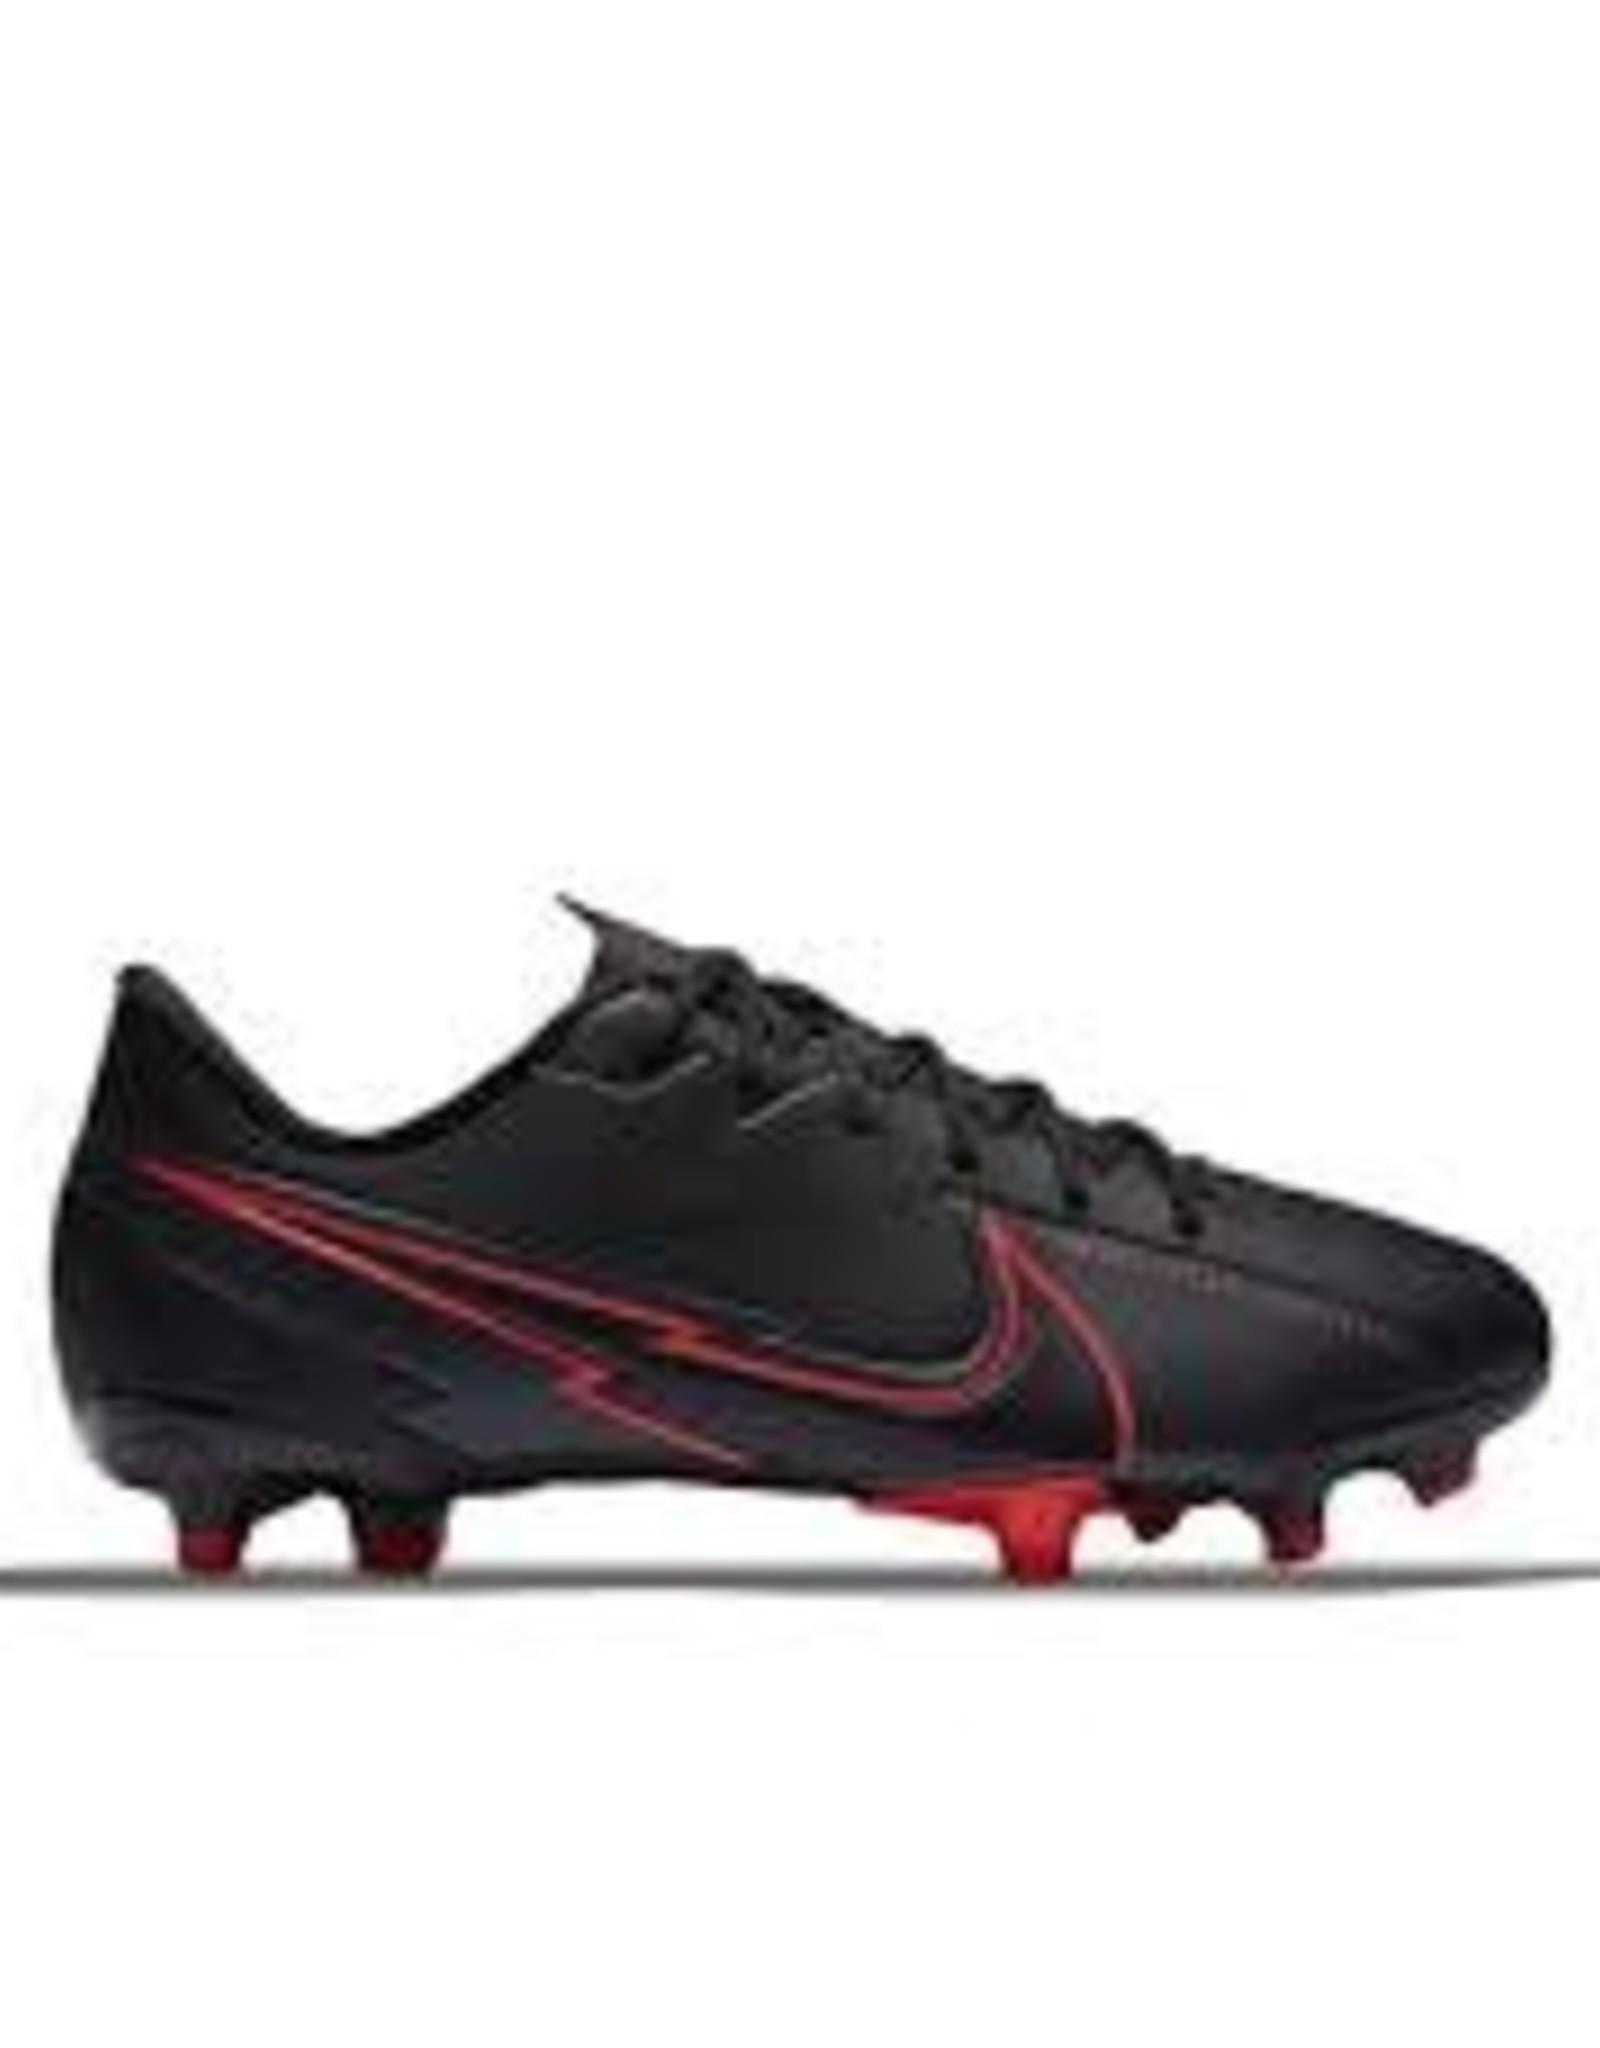 Nike Nike FG/MG Vapor 13 Academy Jr